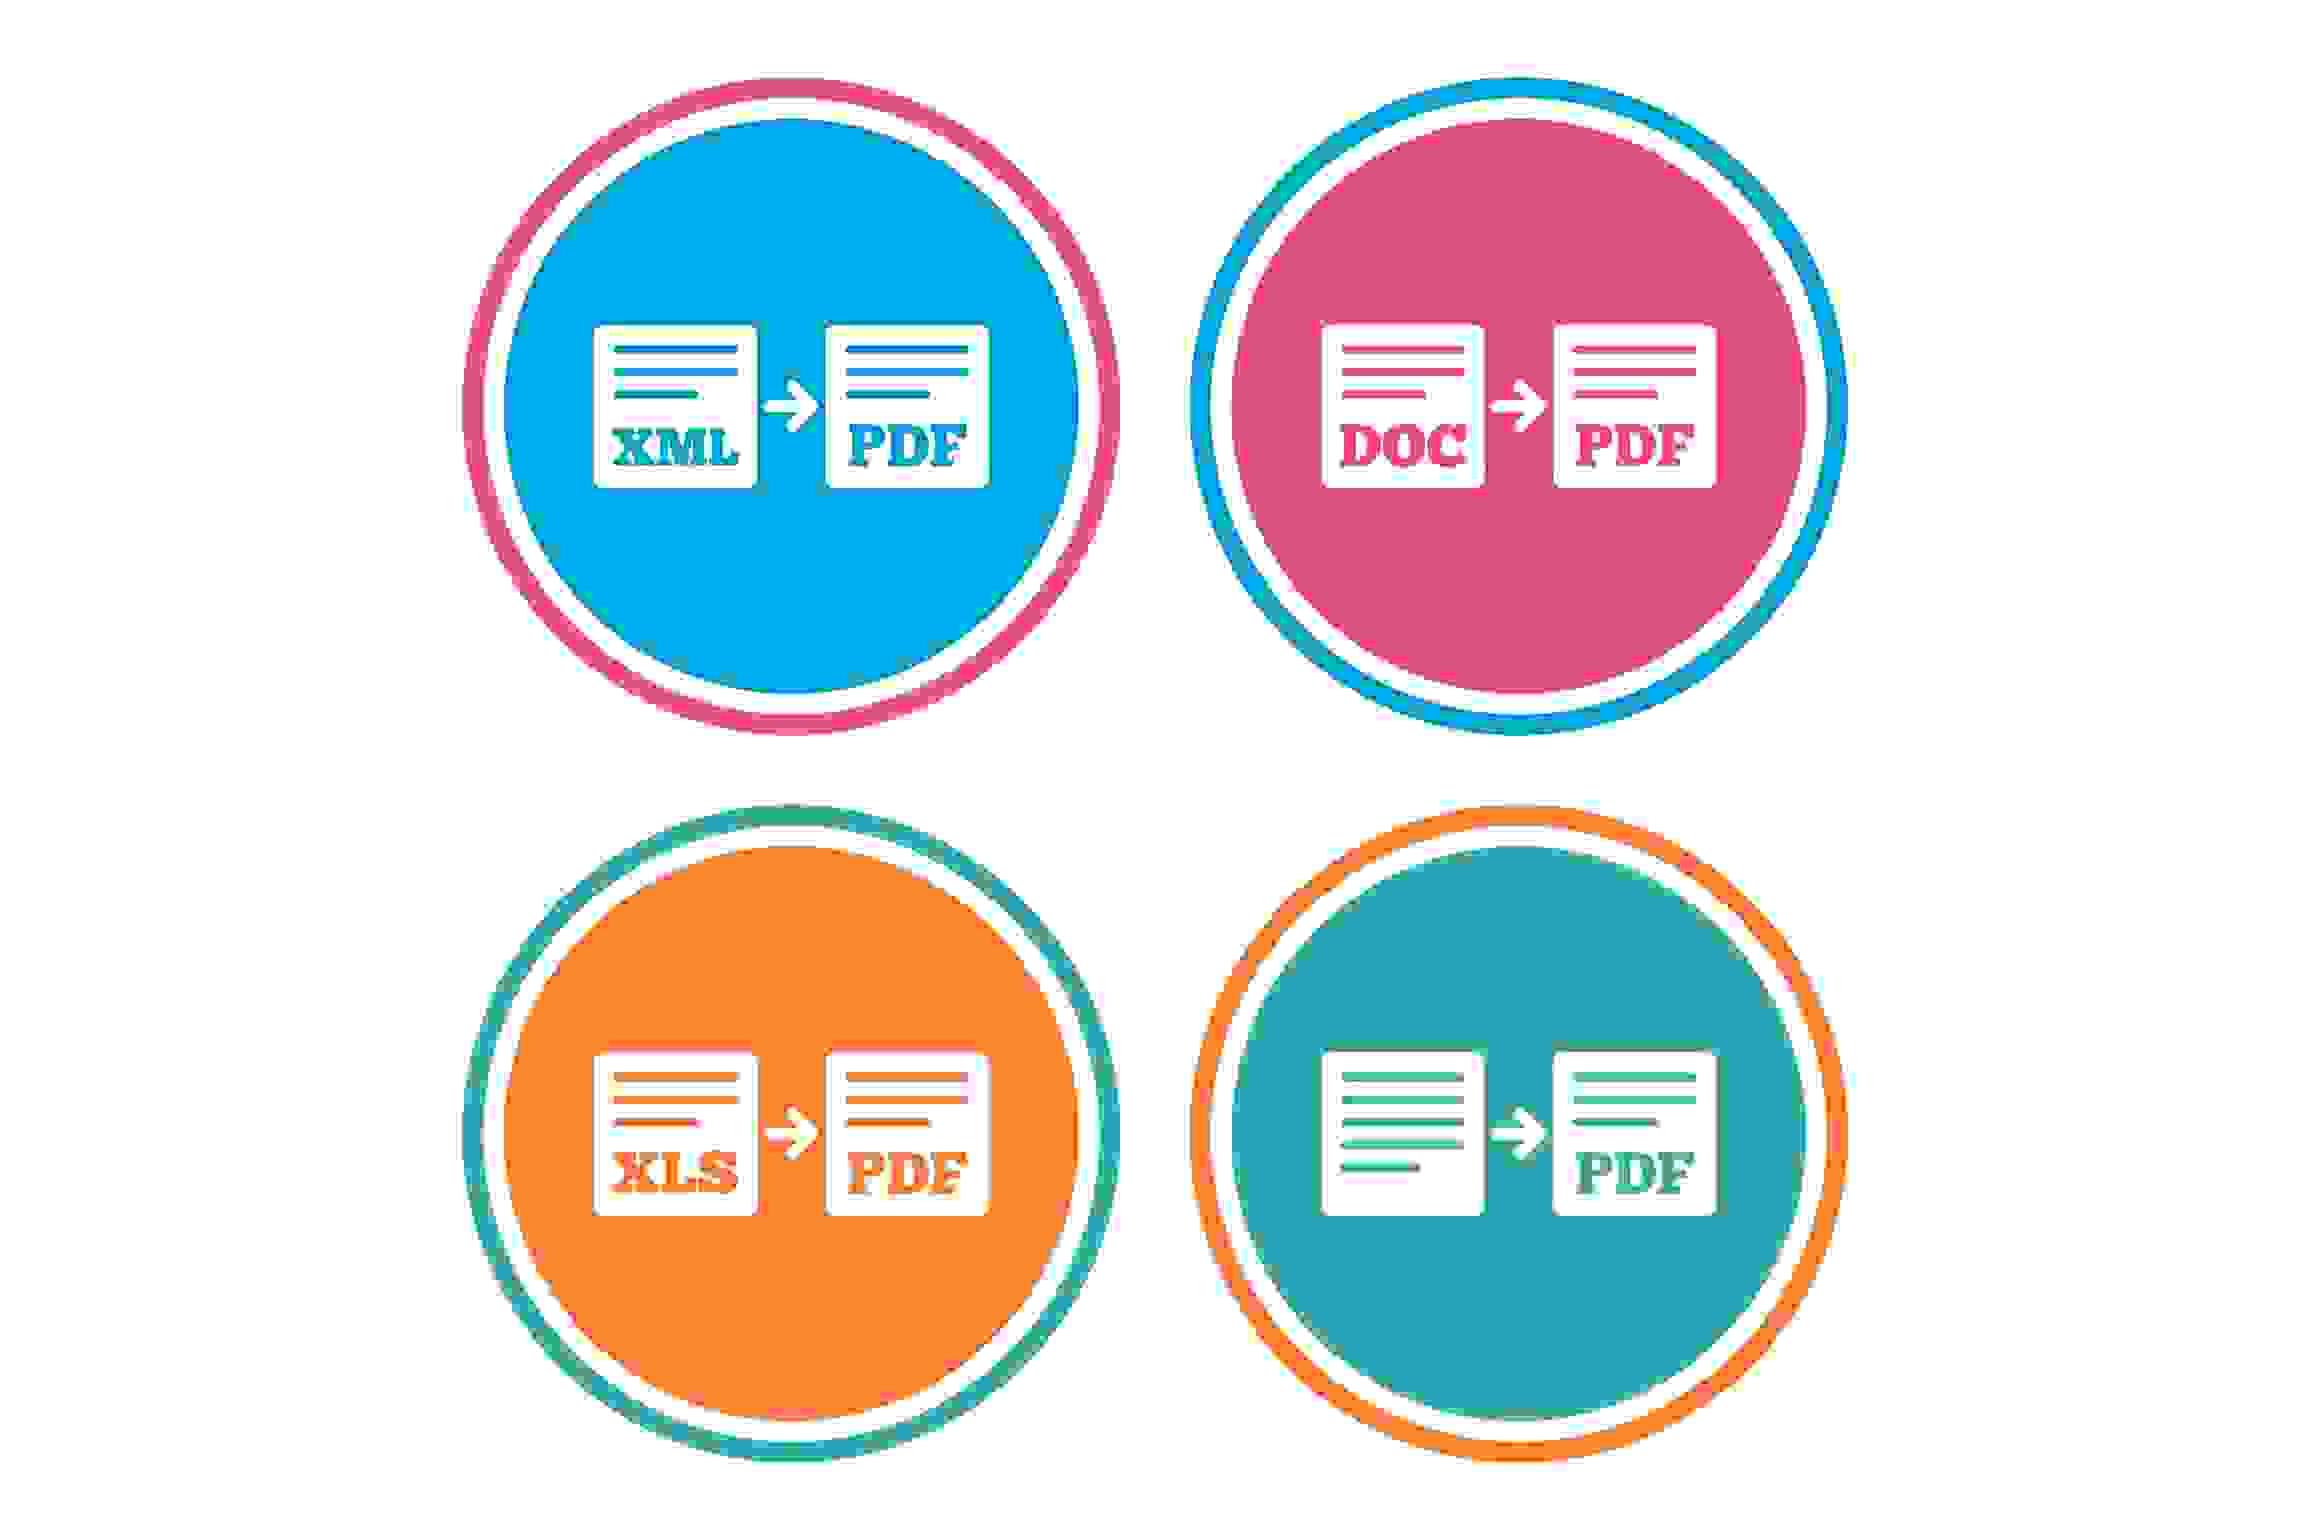 تحويل ملف PDF إلى تنسيق آخر DOCX